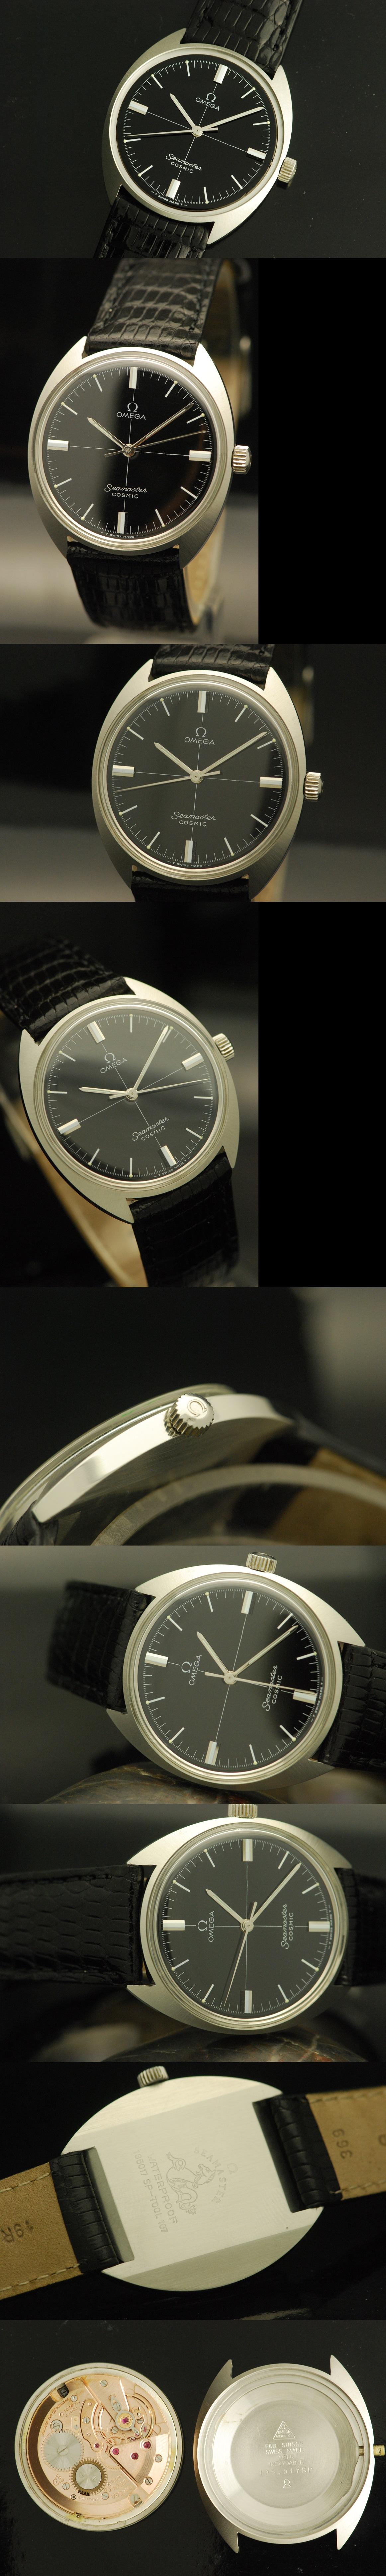 1969 Omega Seamaster Cosmic Vintage Gent's Watch Vintage